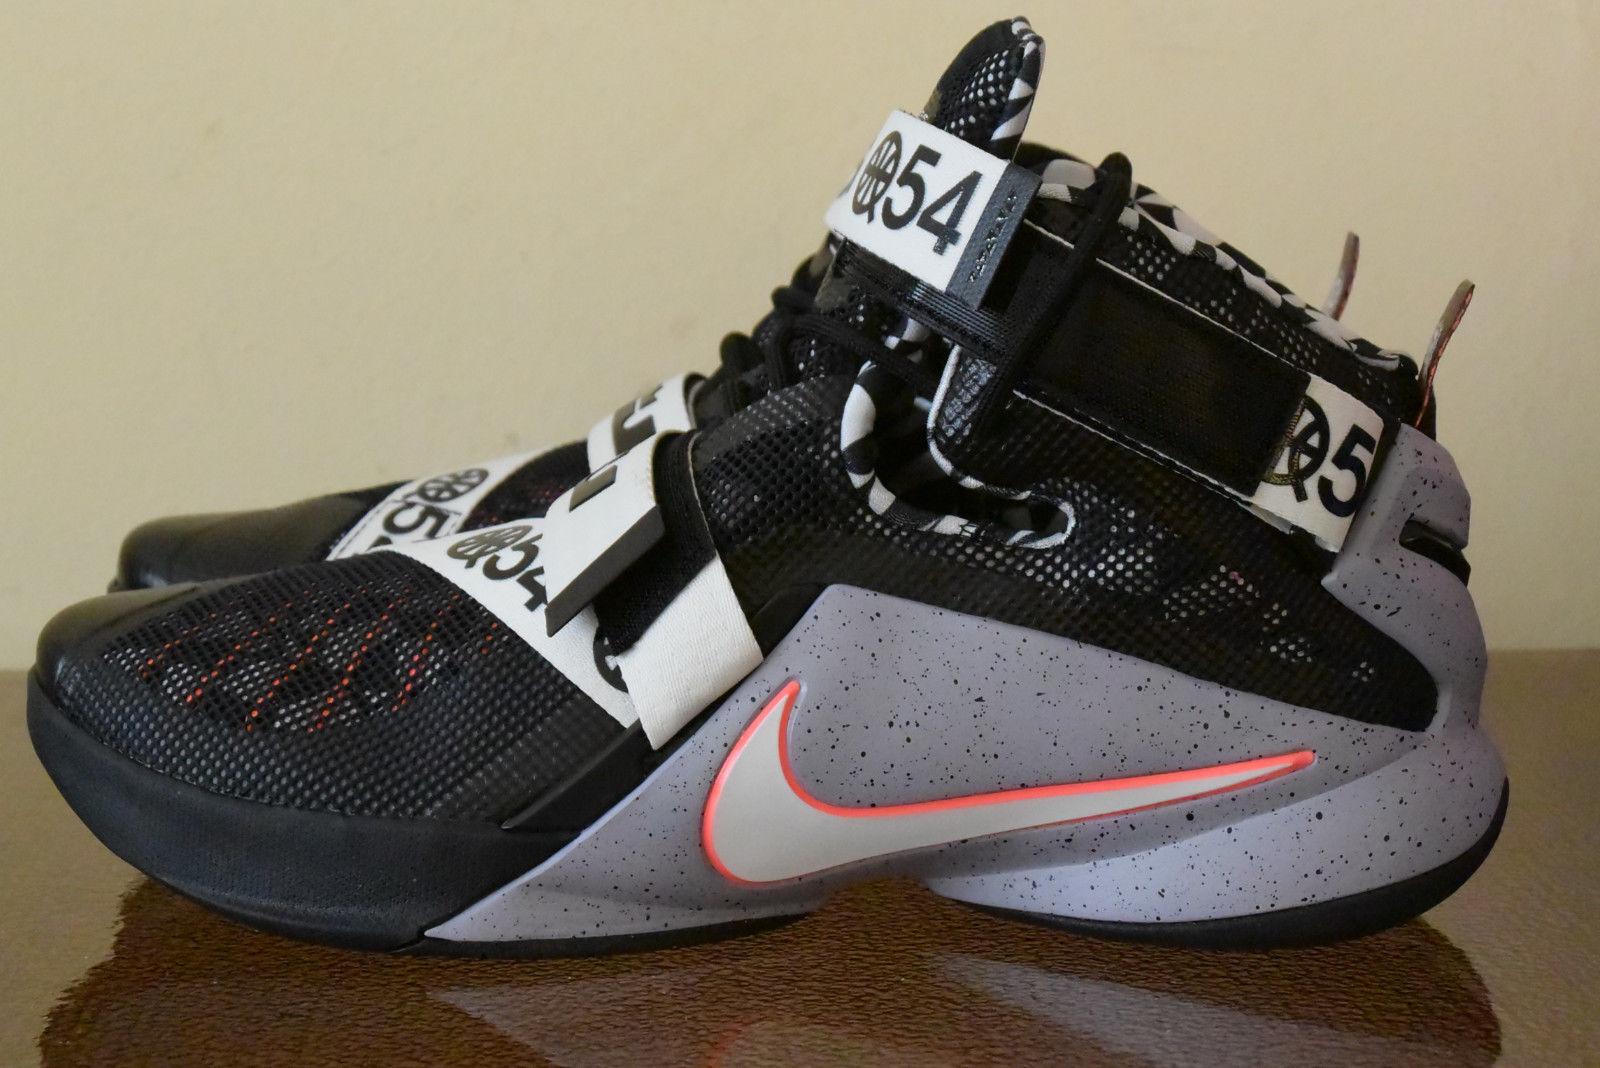 Nike Lebron Soldier IX LTD Quai 54 Limited Edition 810803-015 Sz. 12